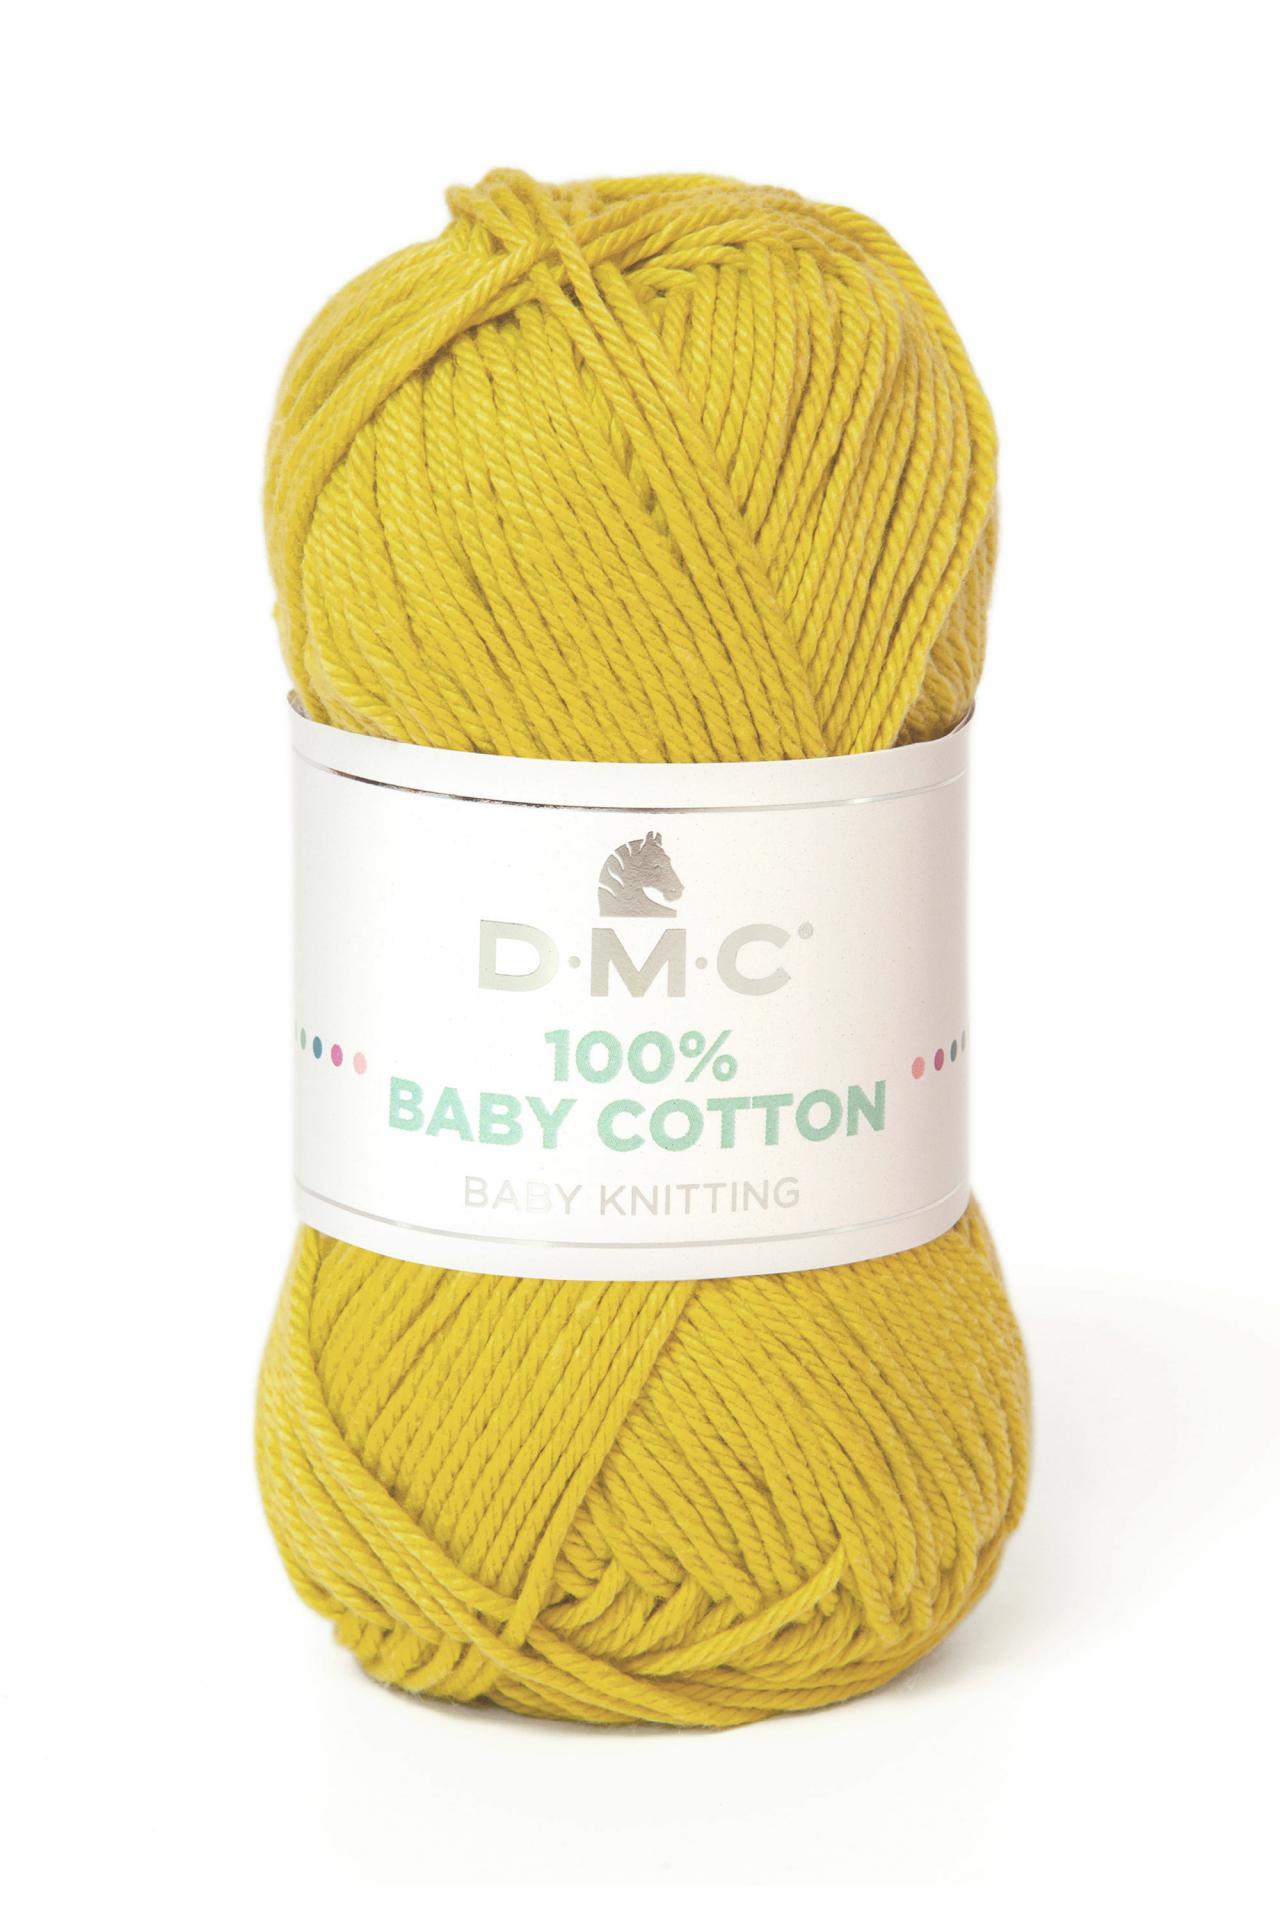 Hilo DMC 100% Baby Cotton 771 Mostaza